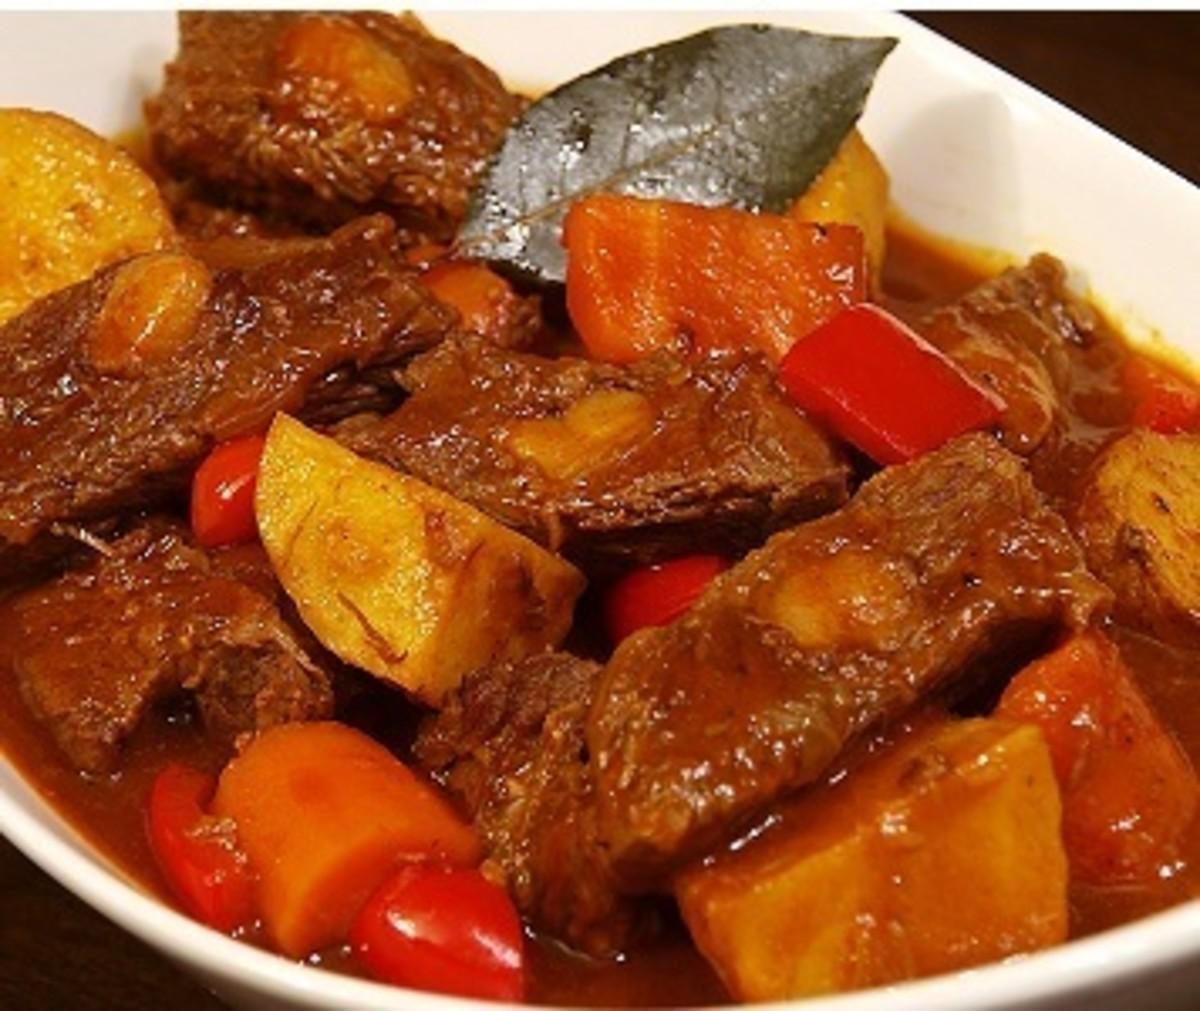 Filipino mechado (stewed beef)